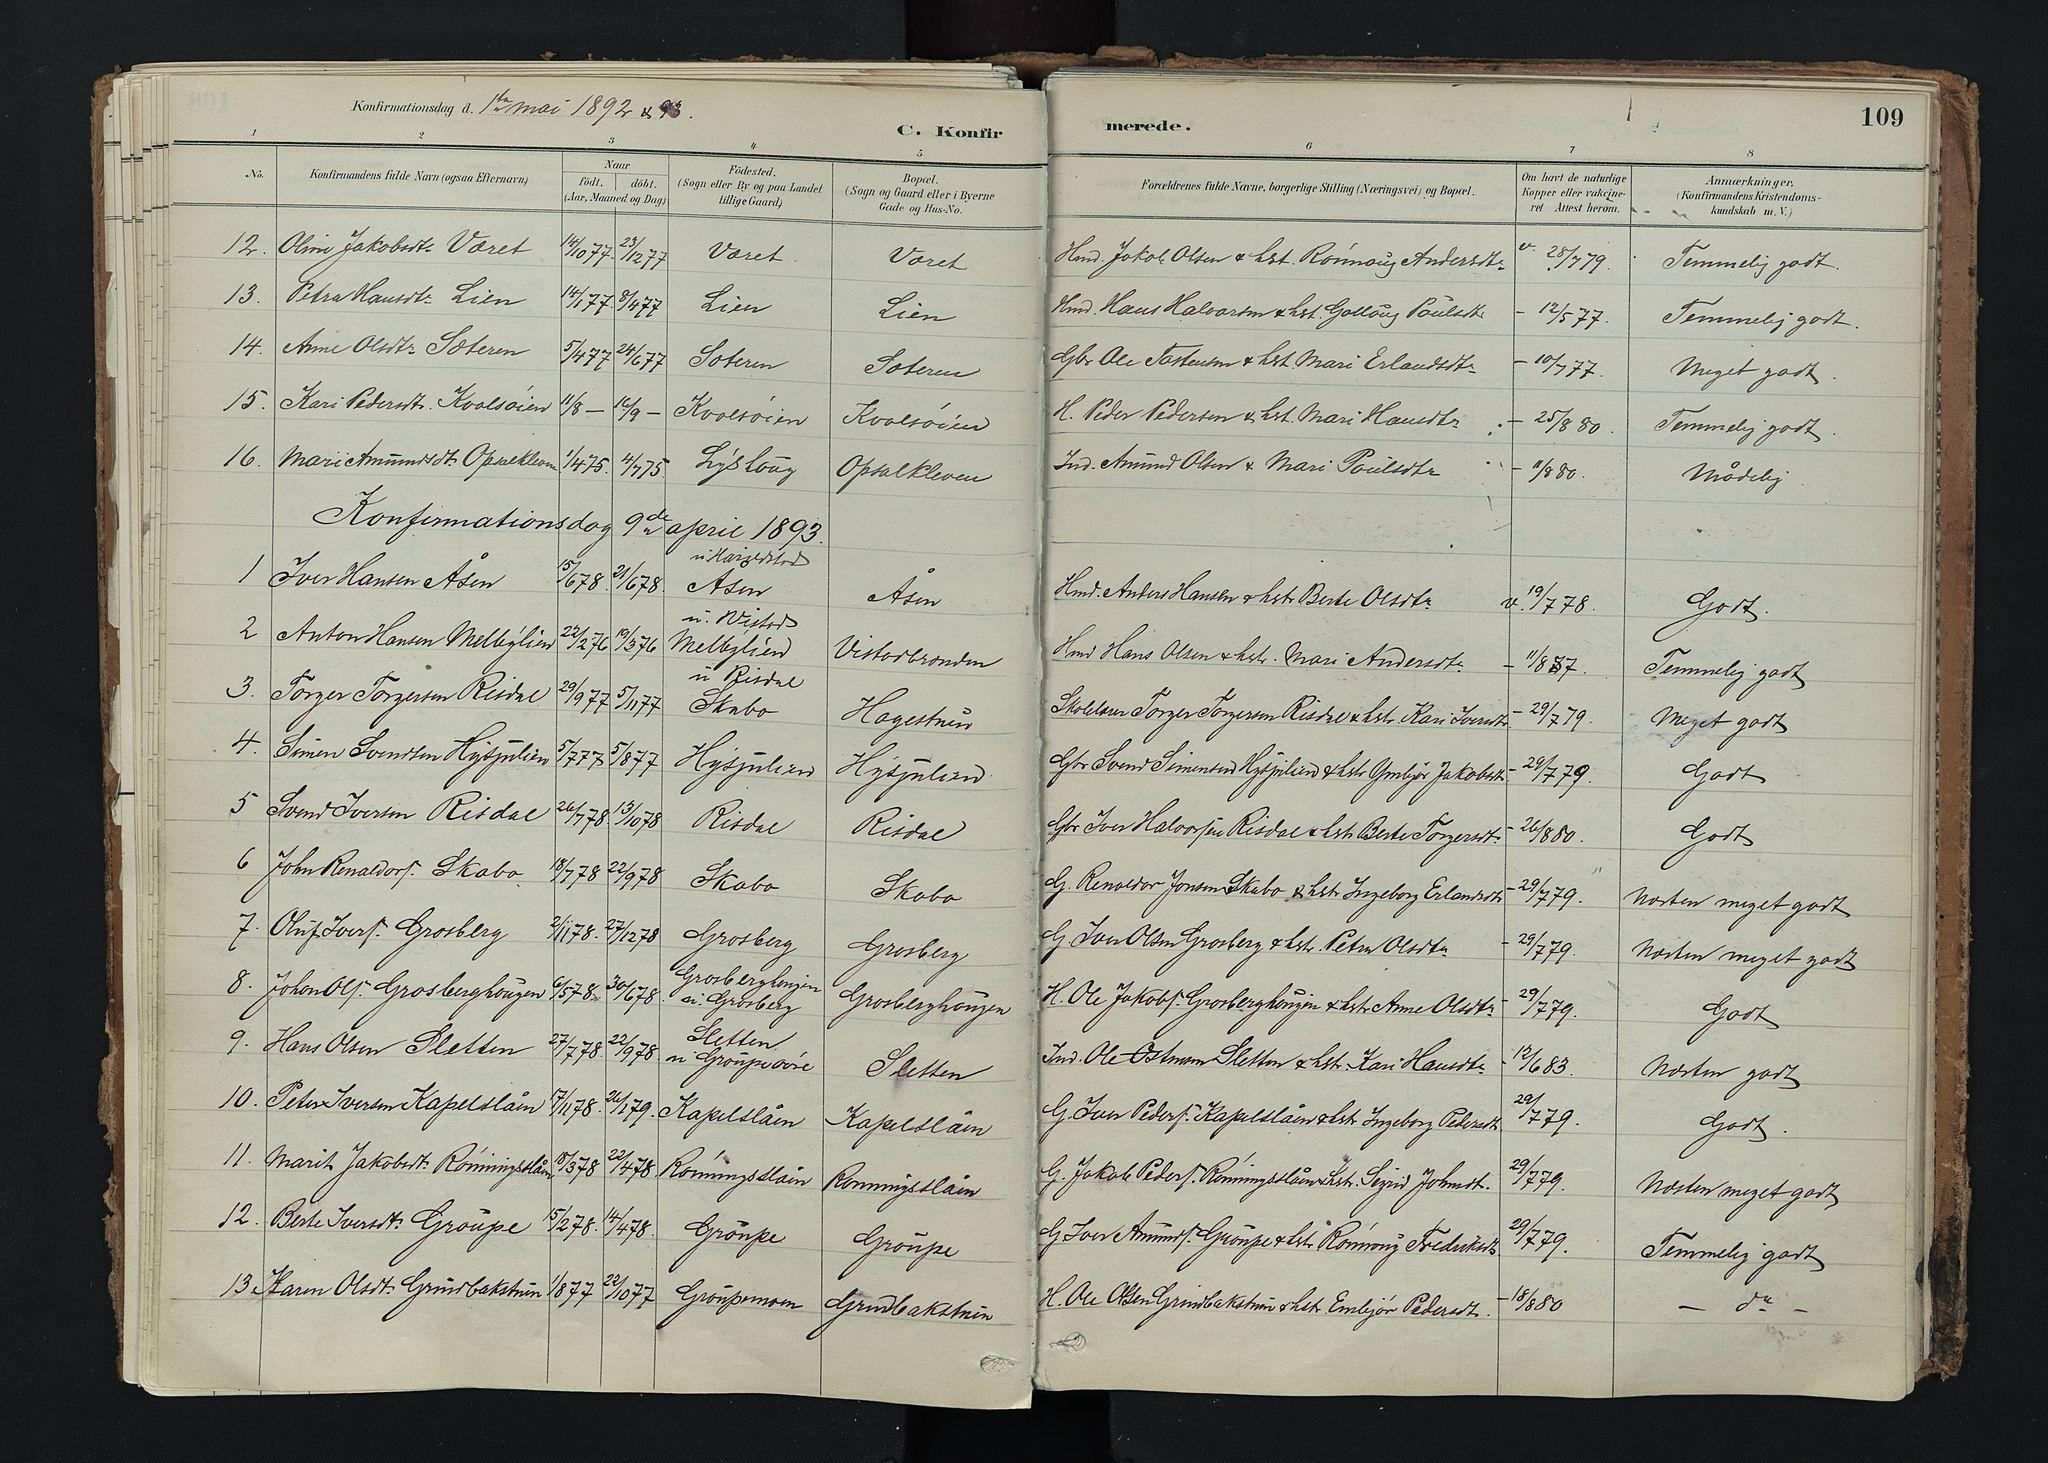 SAH, Nord-Fron prestekontor, Ministerialbok nr. 5, 1884-1914, s. 109